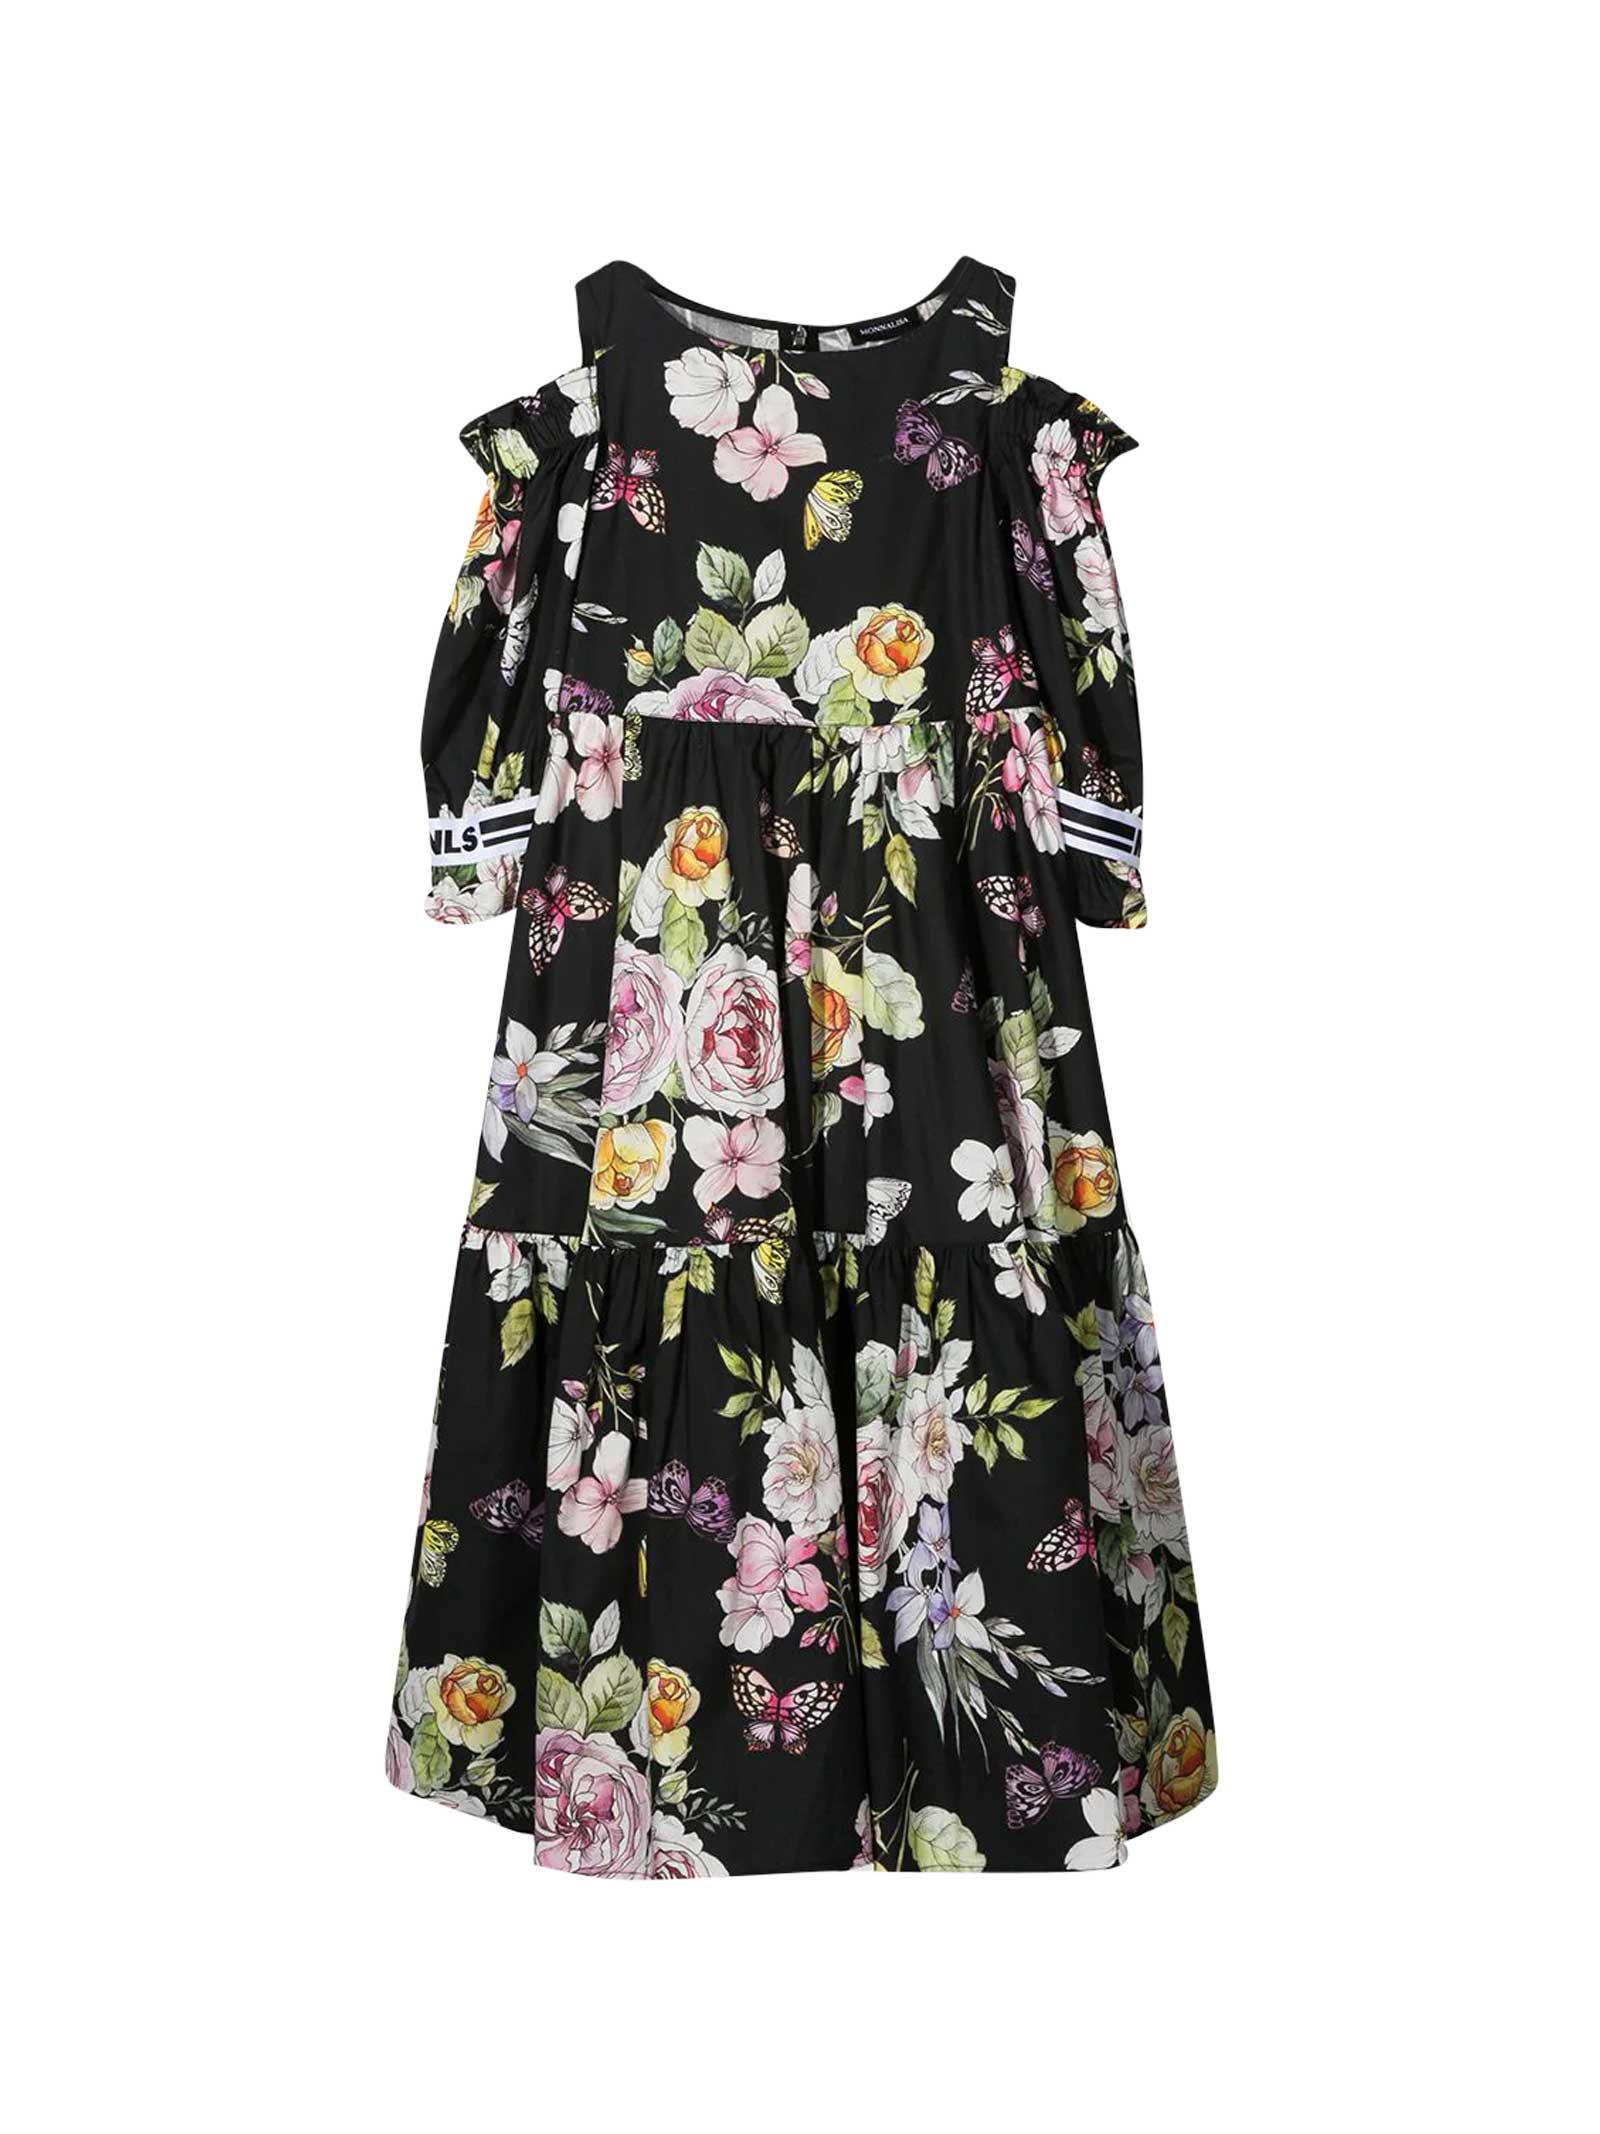 Buy Monnalisa Black Dress With Flower Print online, shop Monnalisa with free shipping